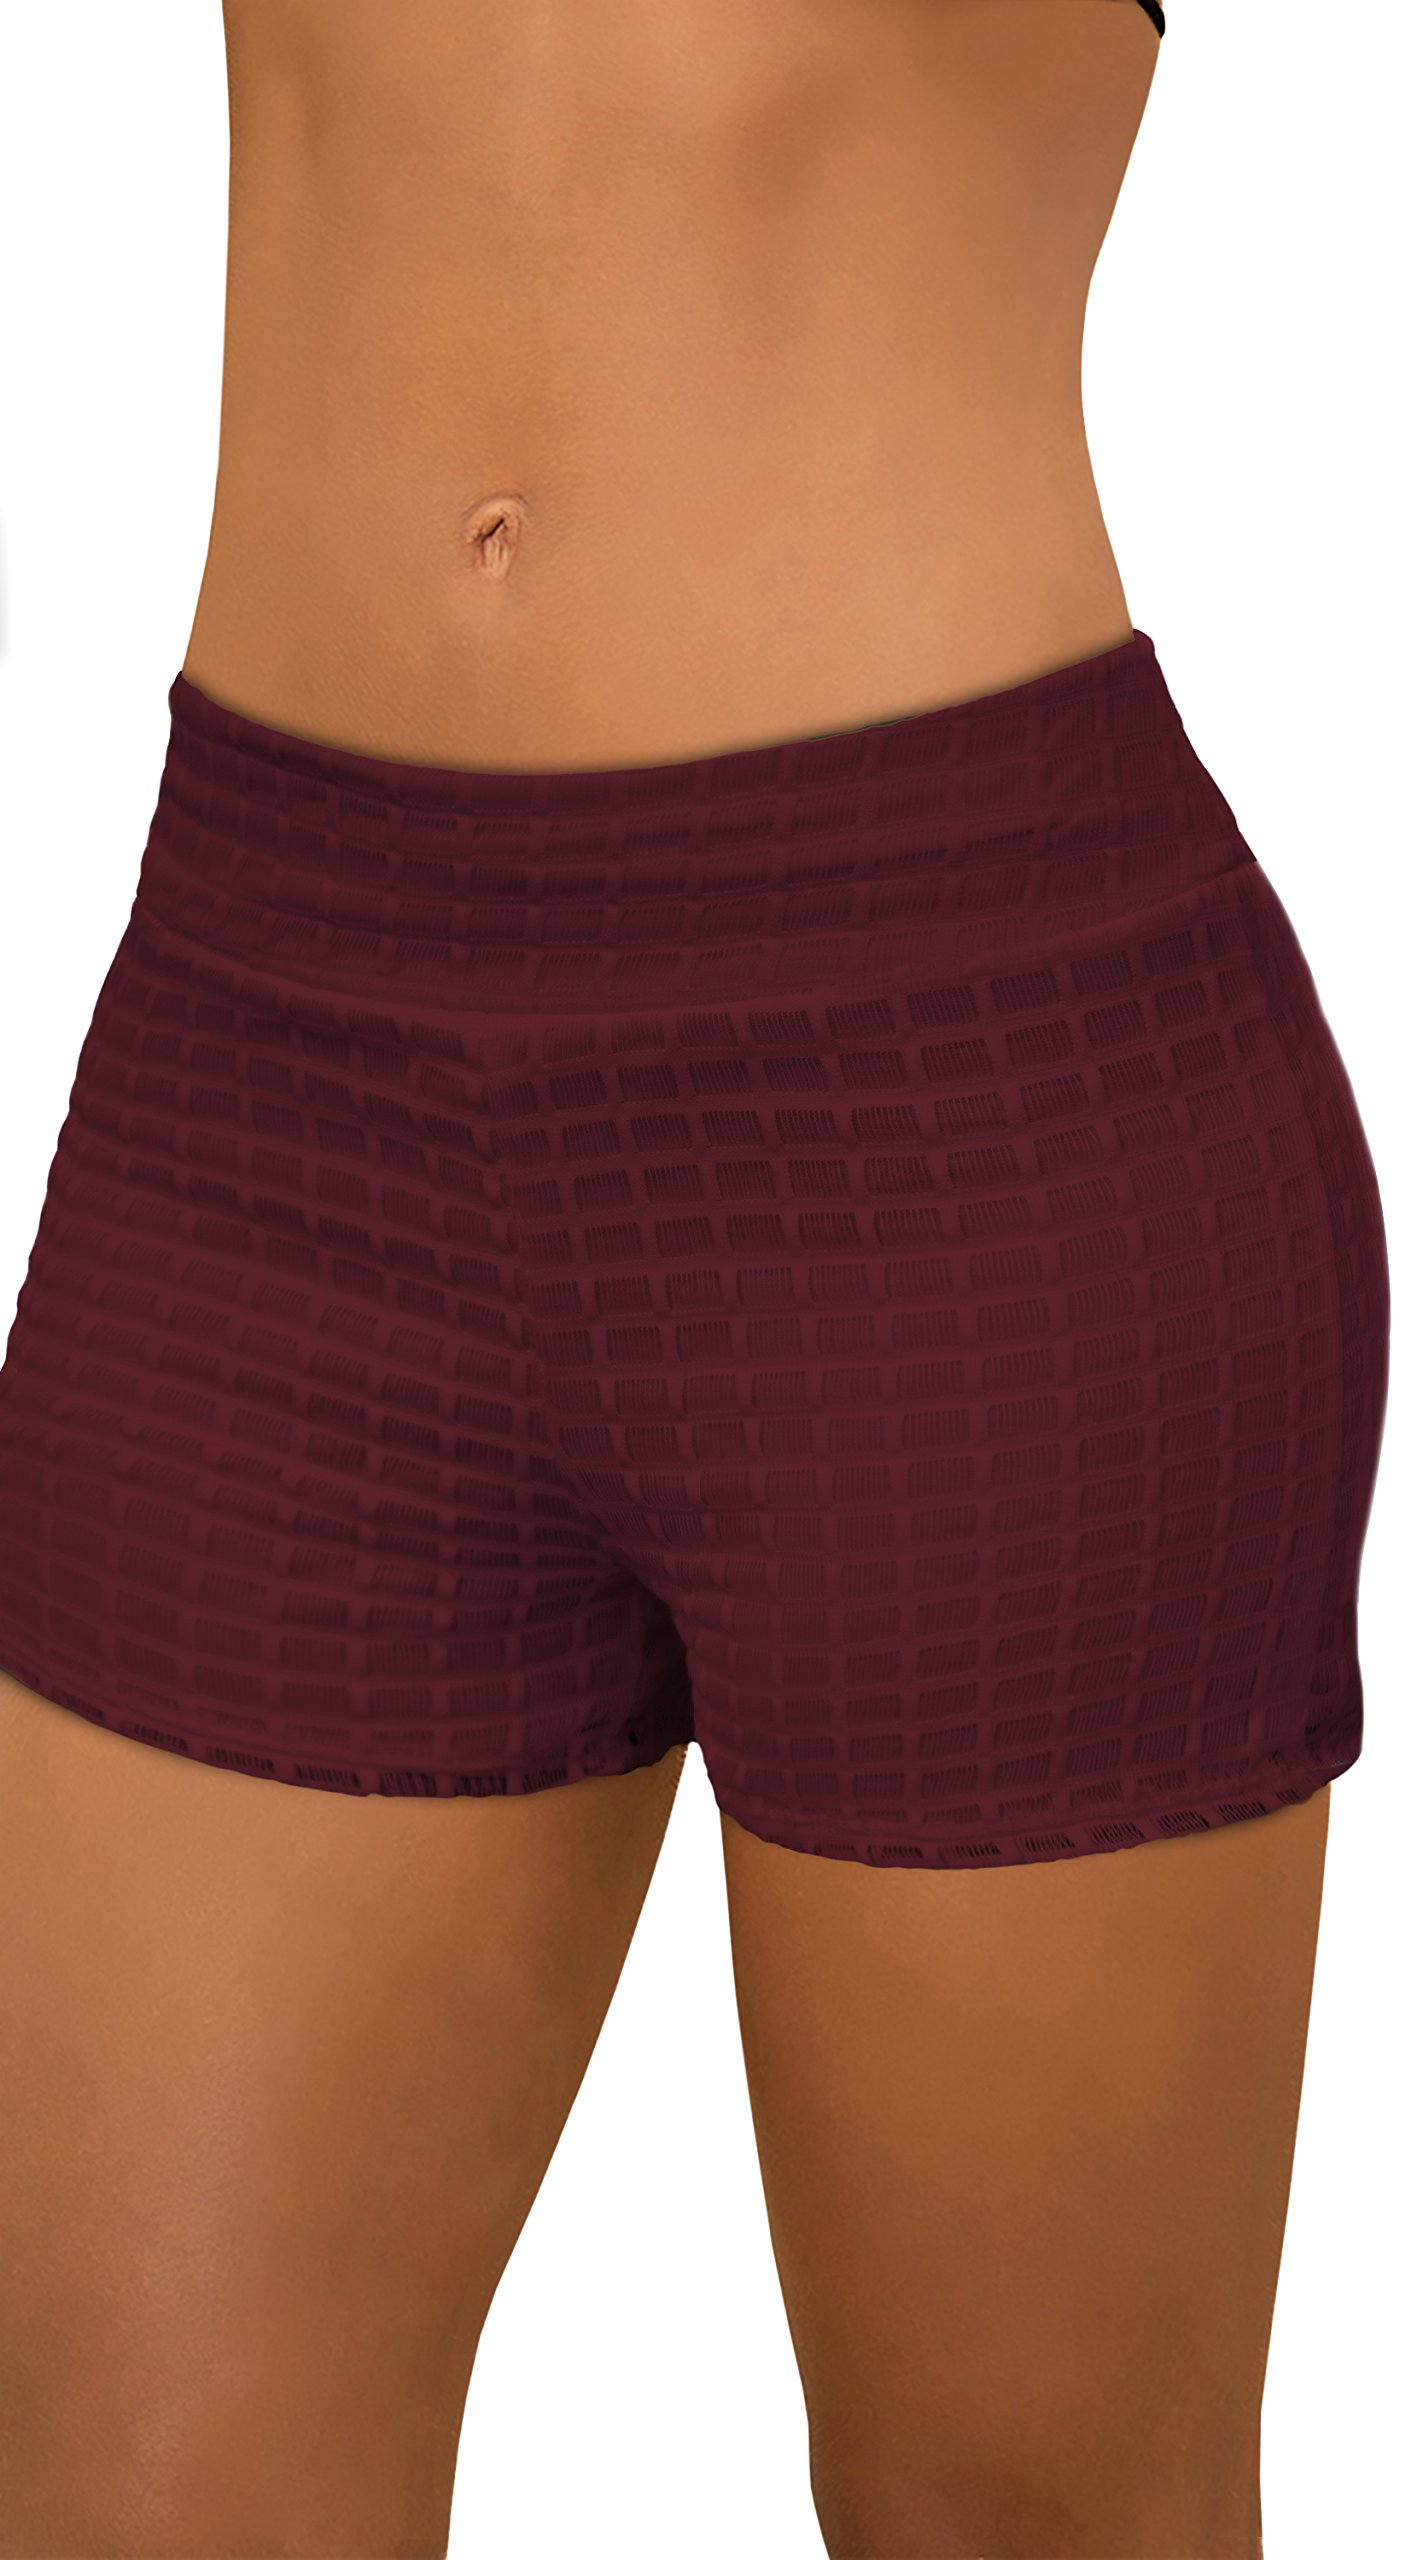 Womens Fashion Lace Shorts-KSH46124-4027-WINE-L